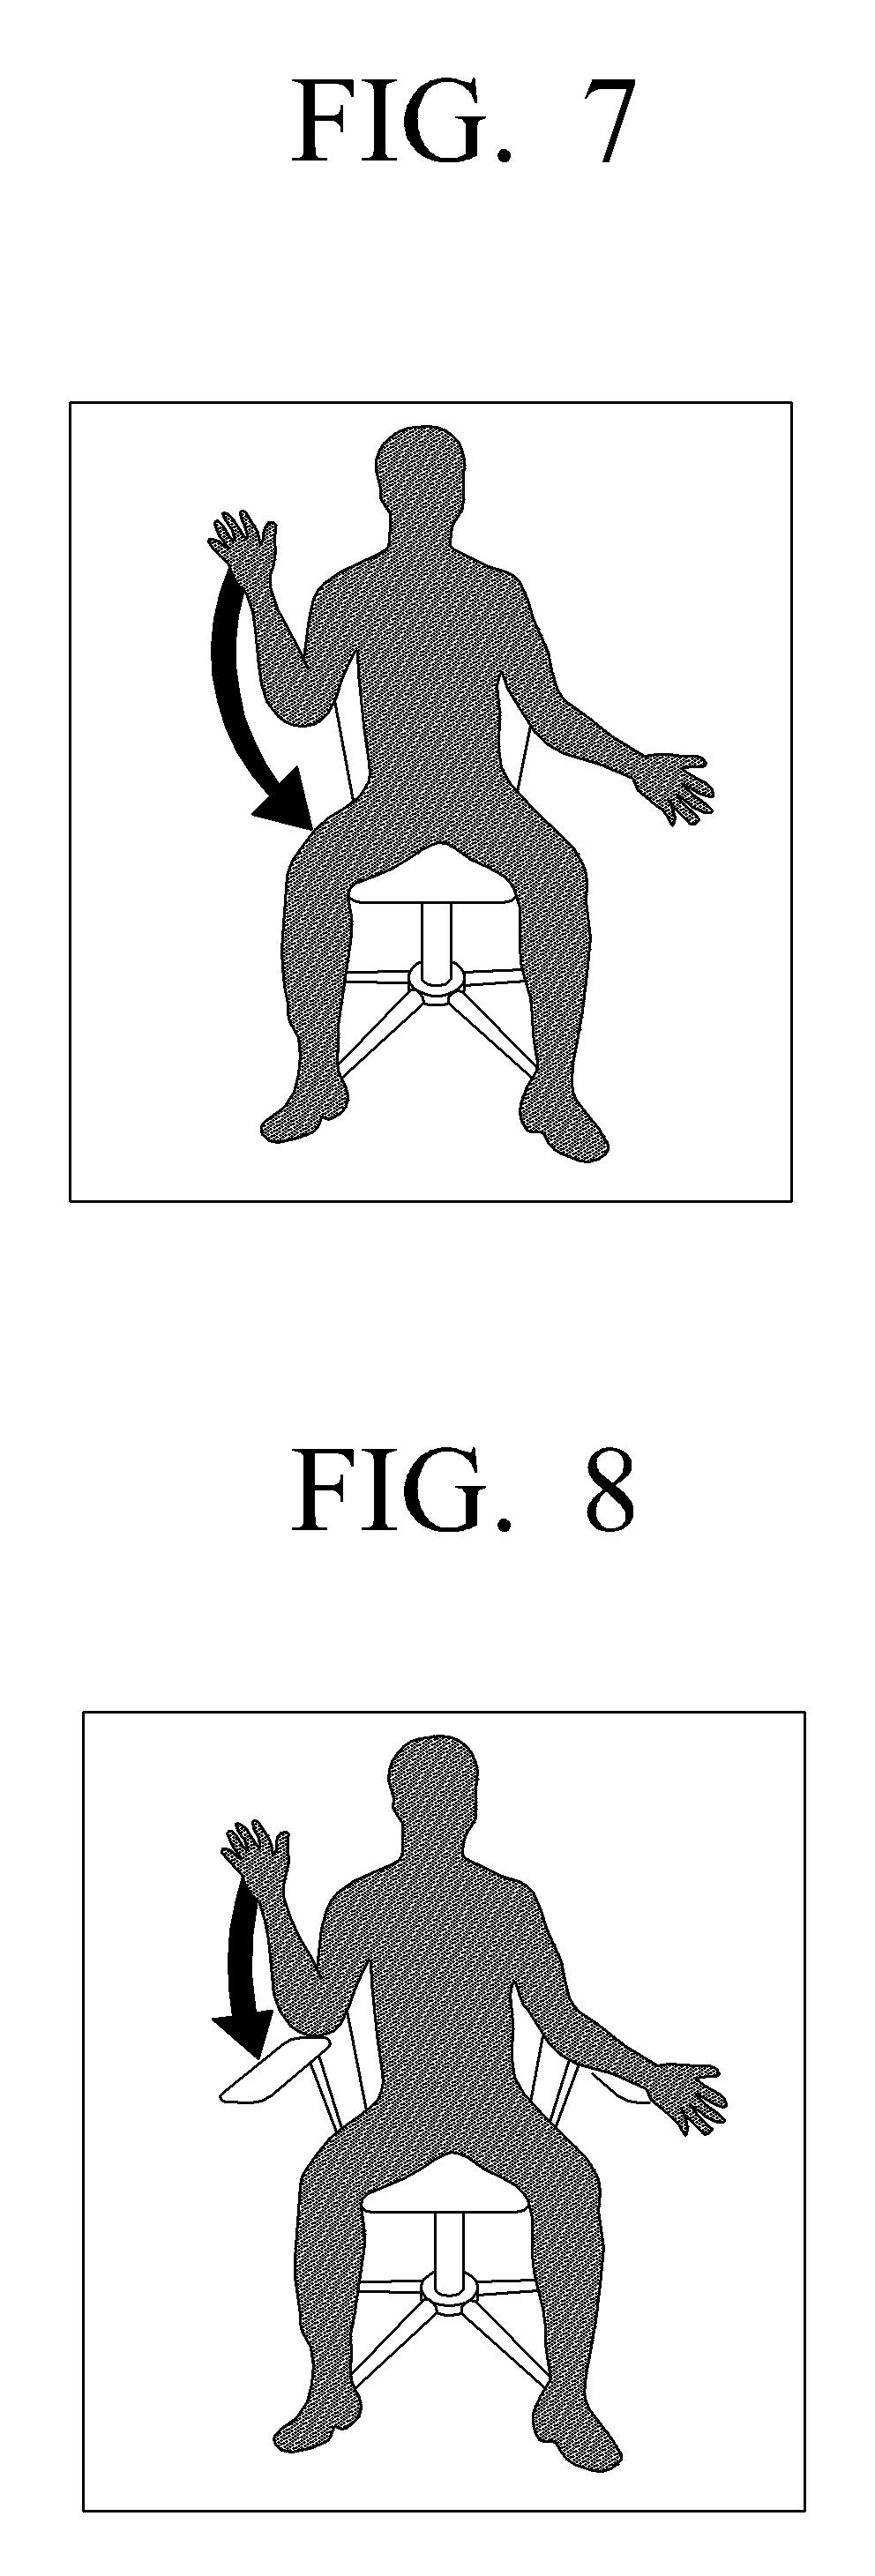 Patente US20120176552.